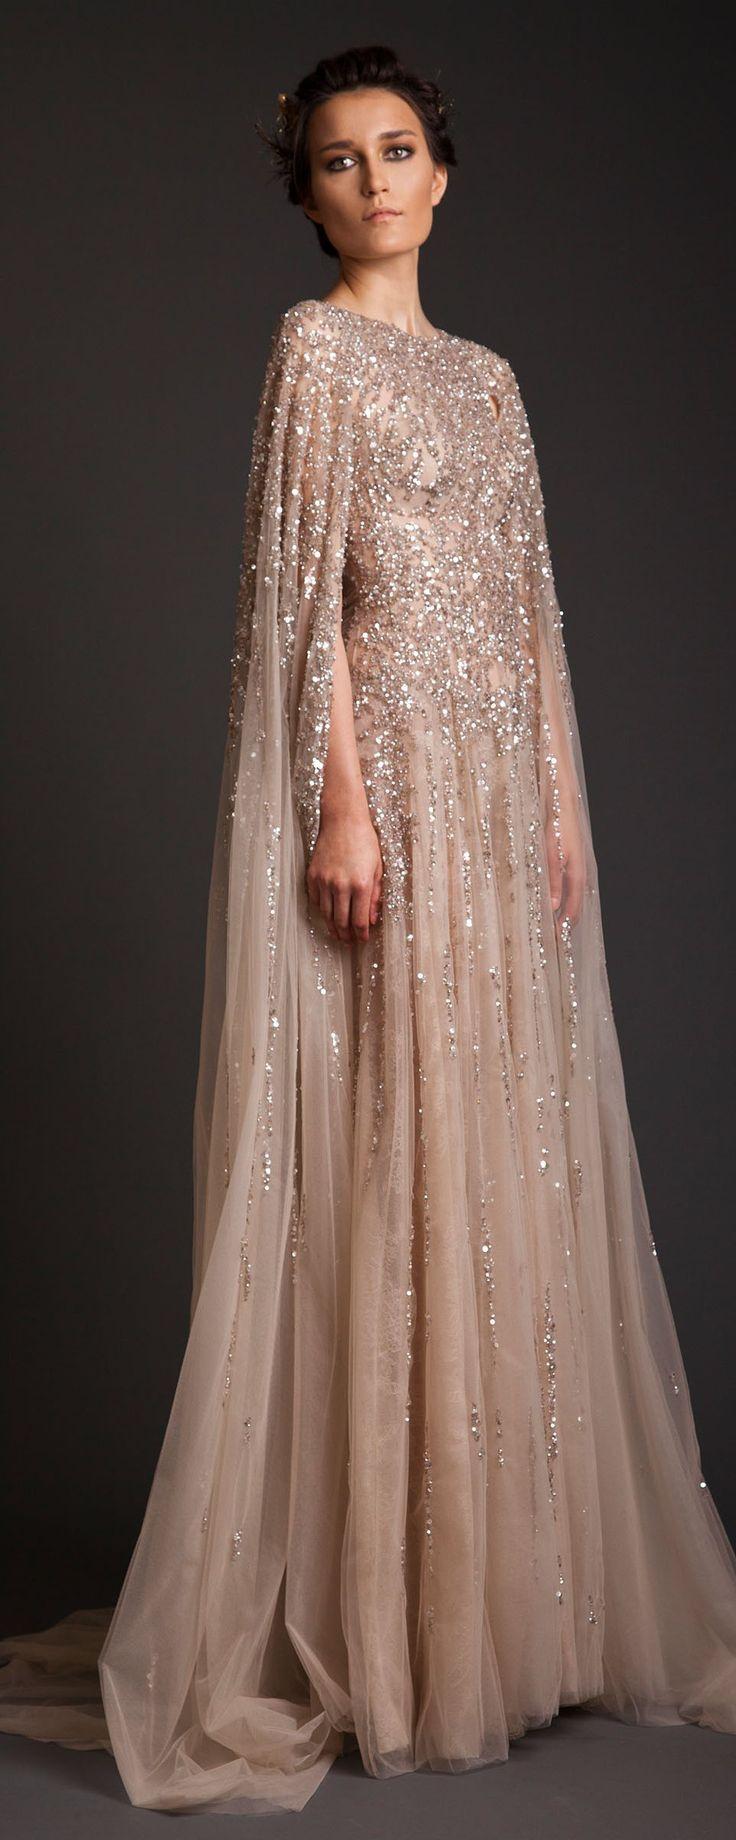 "Krikor Jabotian ""Akhtamar"", S/S 2014 - Couture - http://www.orientpalms.com/krikor-jabotian-4681"